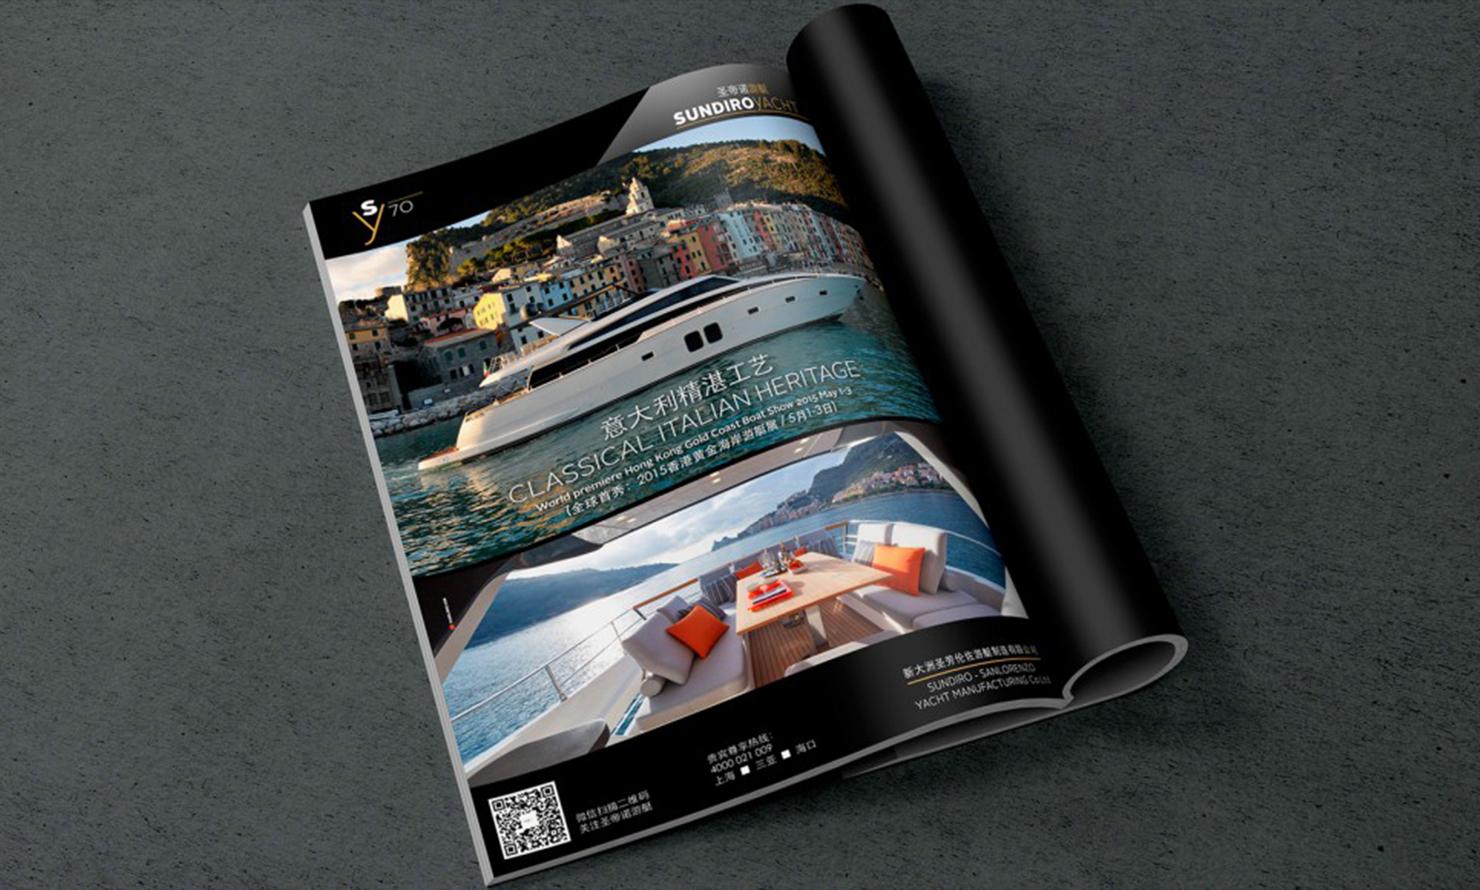 https://www.kubelibre.com/uploads/Slider-work-tutti-clienti/sundiro-yacht-l-eccelenza-italiana-sbarca-in-cina-4.jpg